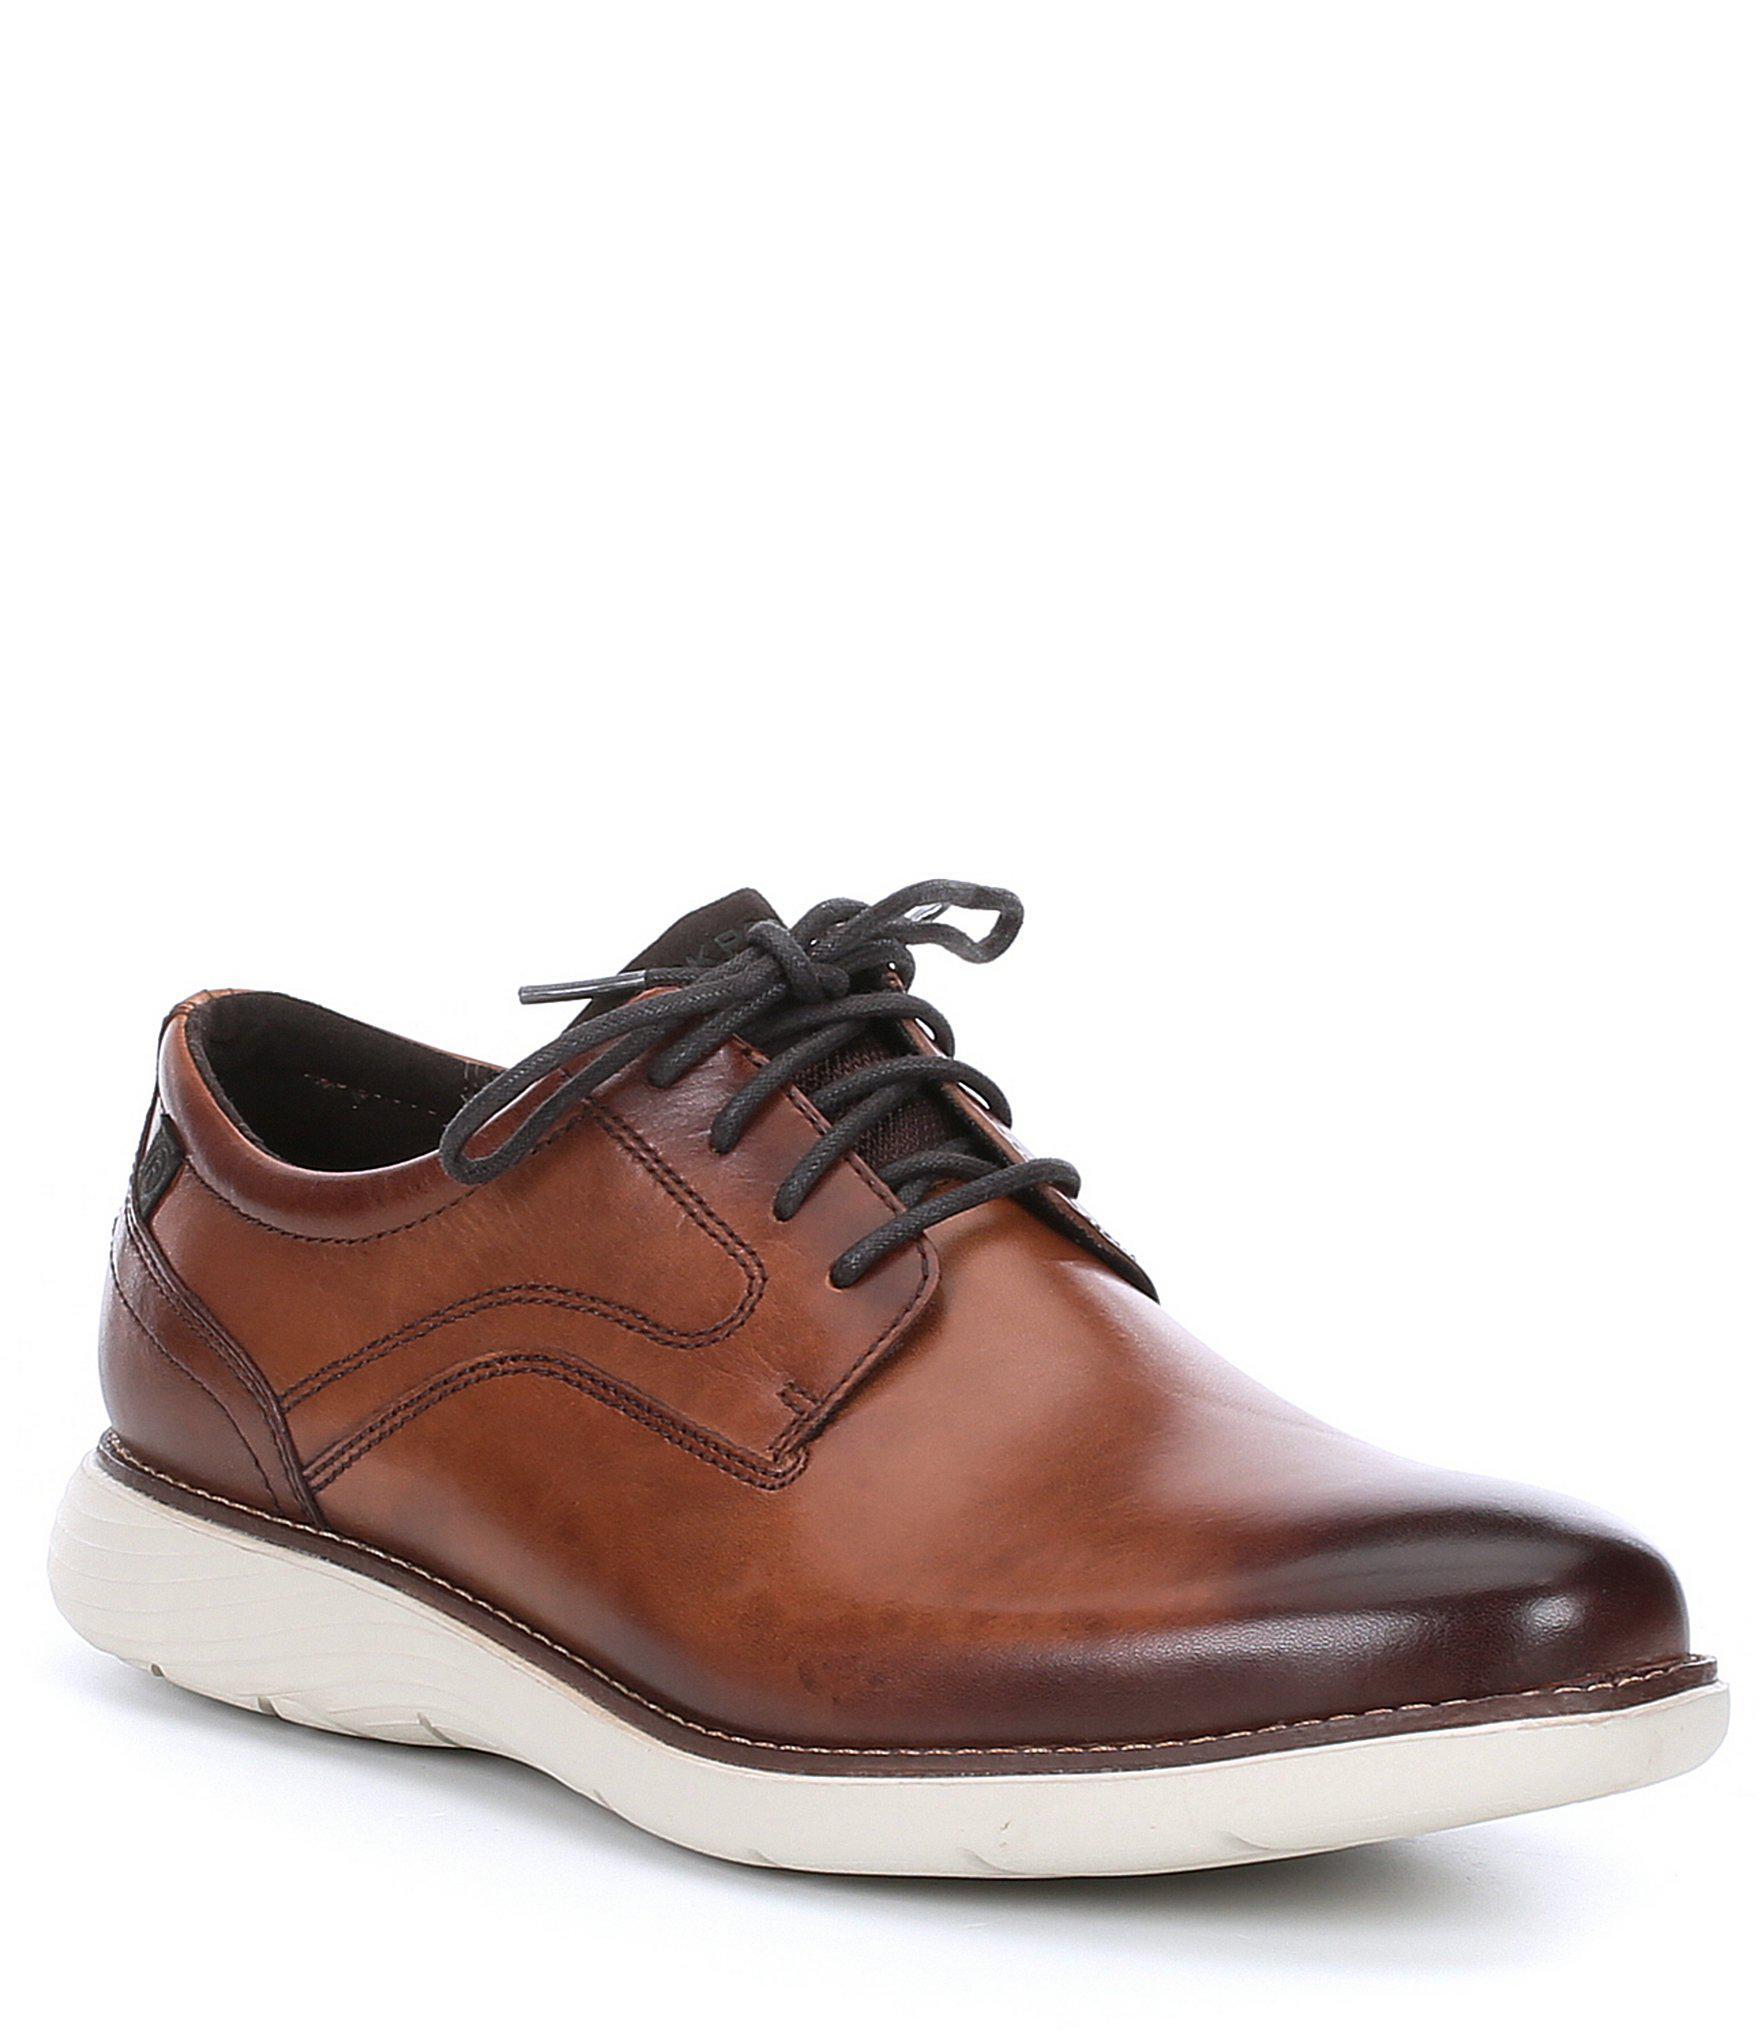 763630655a0e9 Rockport Men's Kessler Leather Plaintoe Oxford in Brown for Men - Lyst